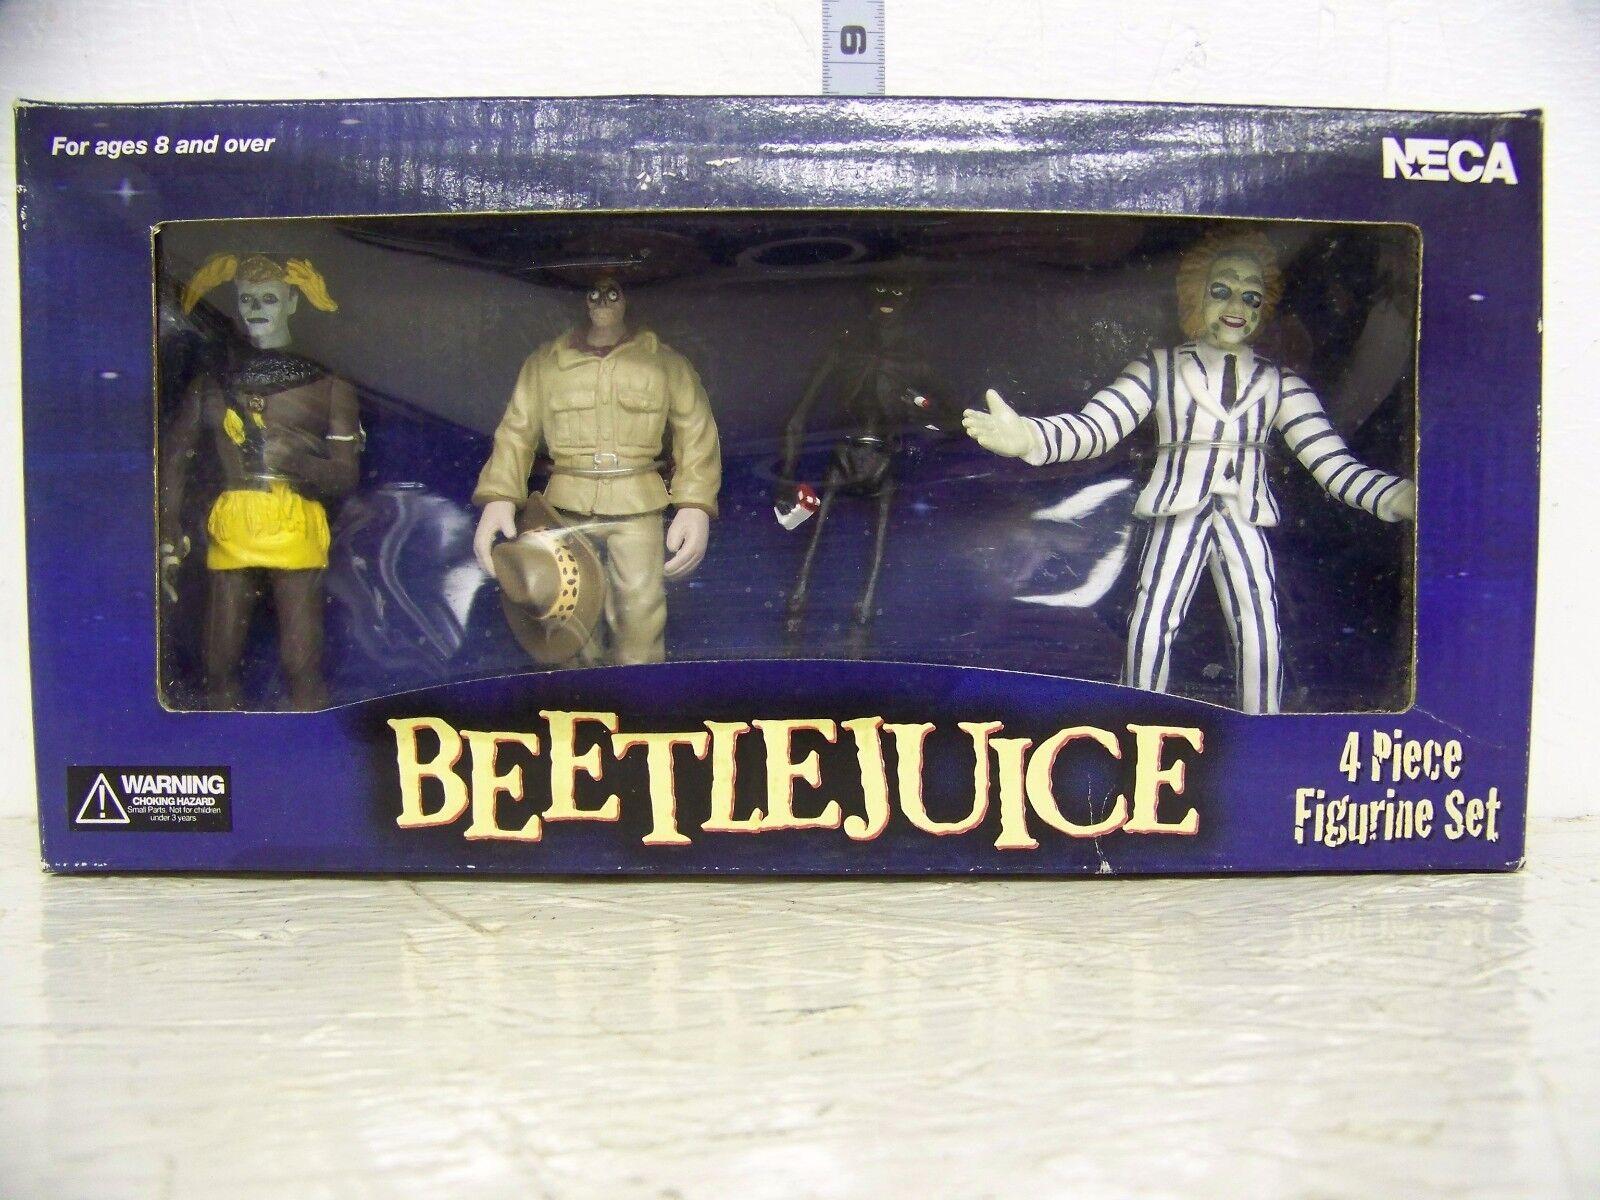 Neca Beetlejuice 4pc Figurine Set Beetlejuice Shrunken Head Guy smoking homme